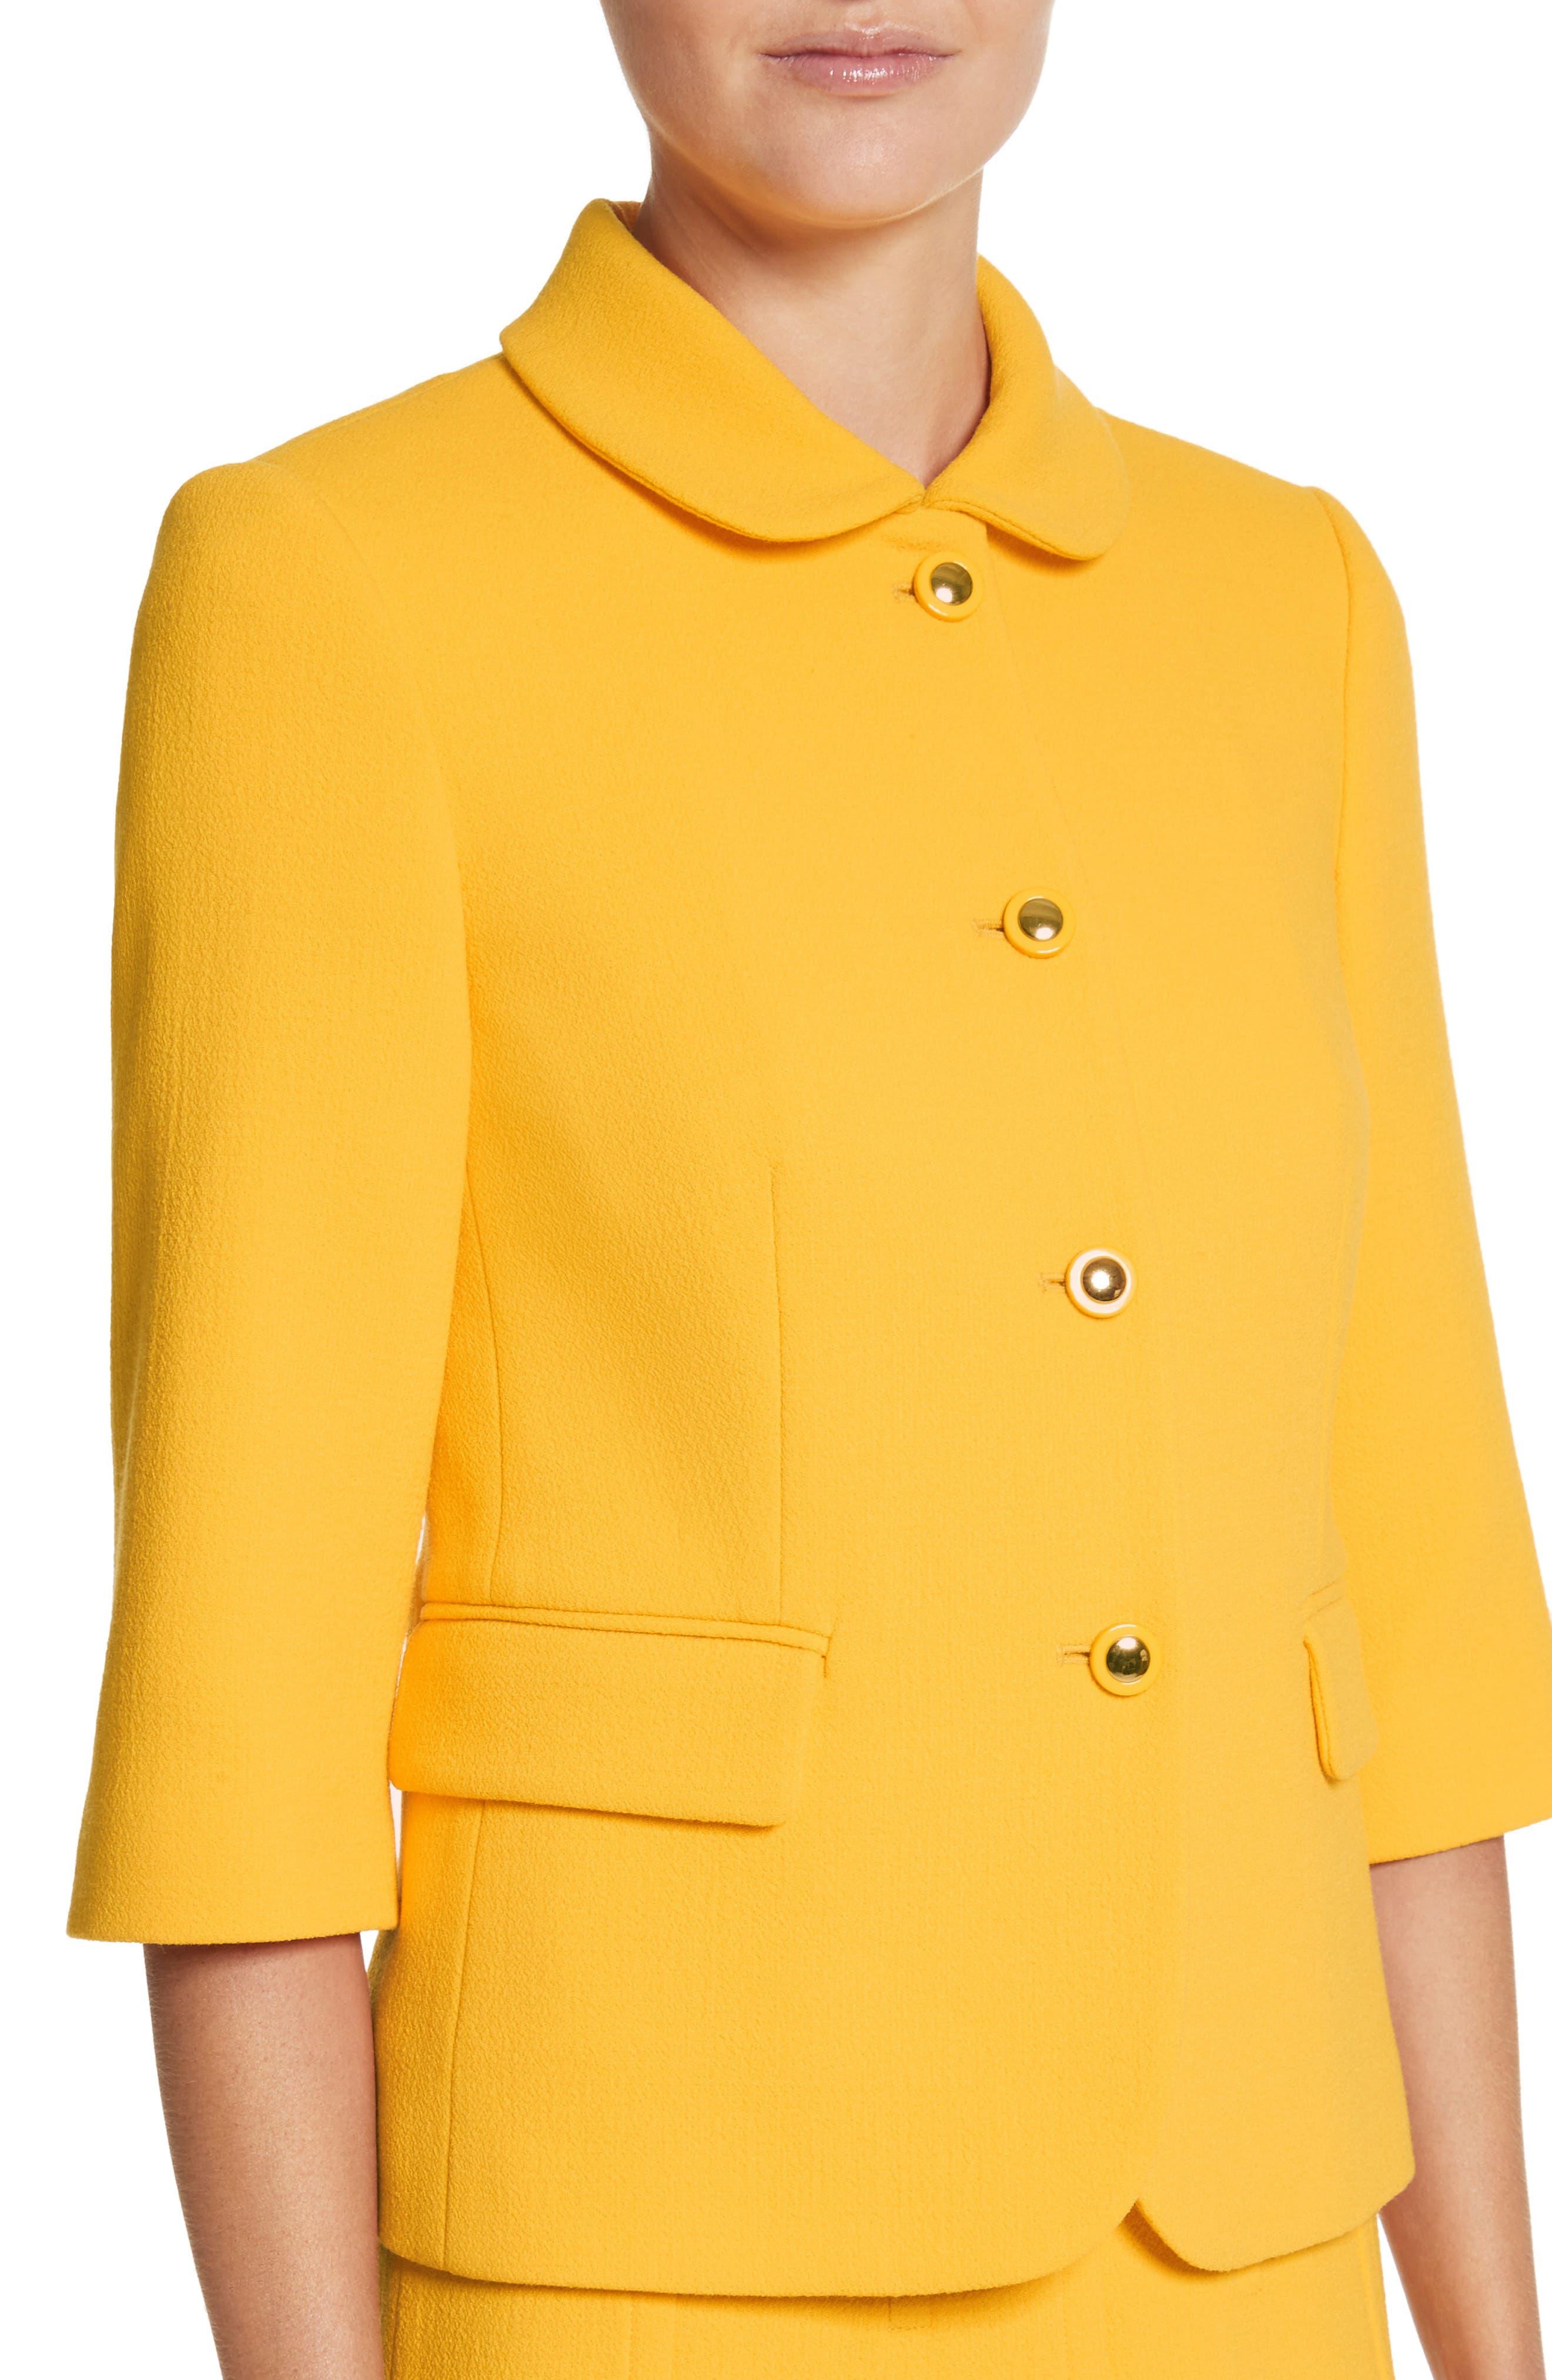 Alternate Image 4  - Michael Kors Stretch Bouclé Crepe Jacket